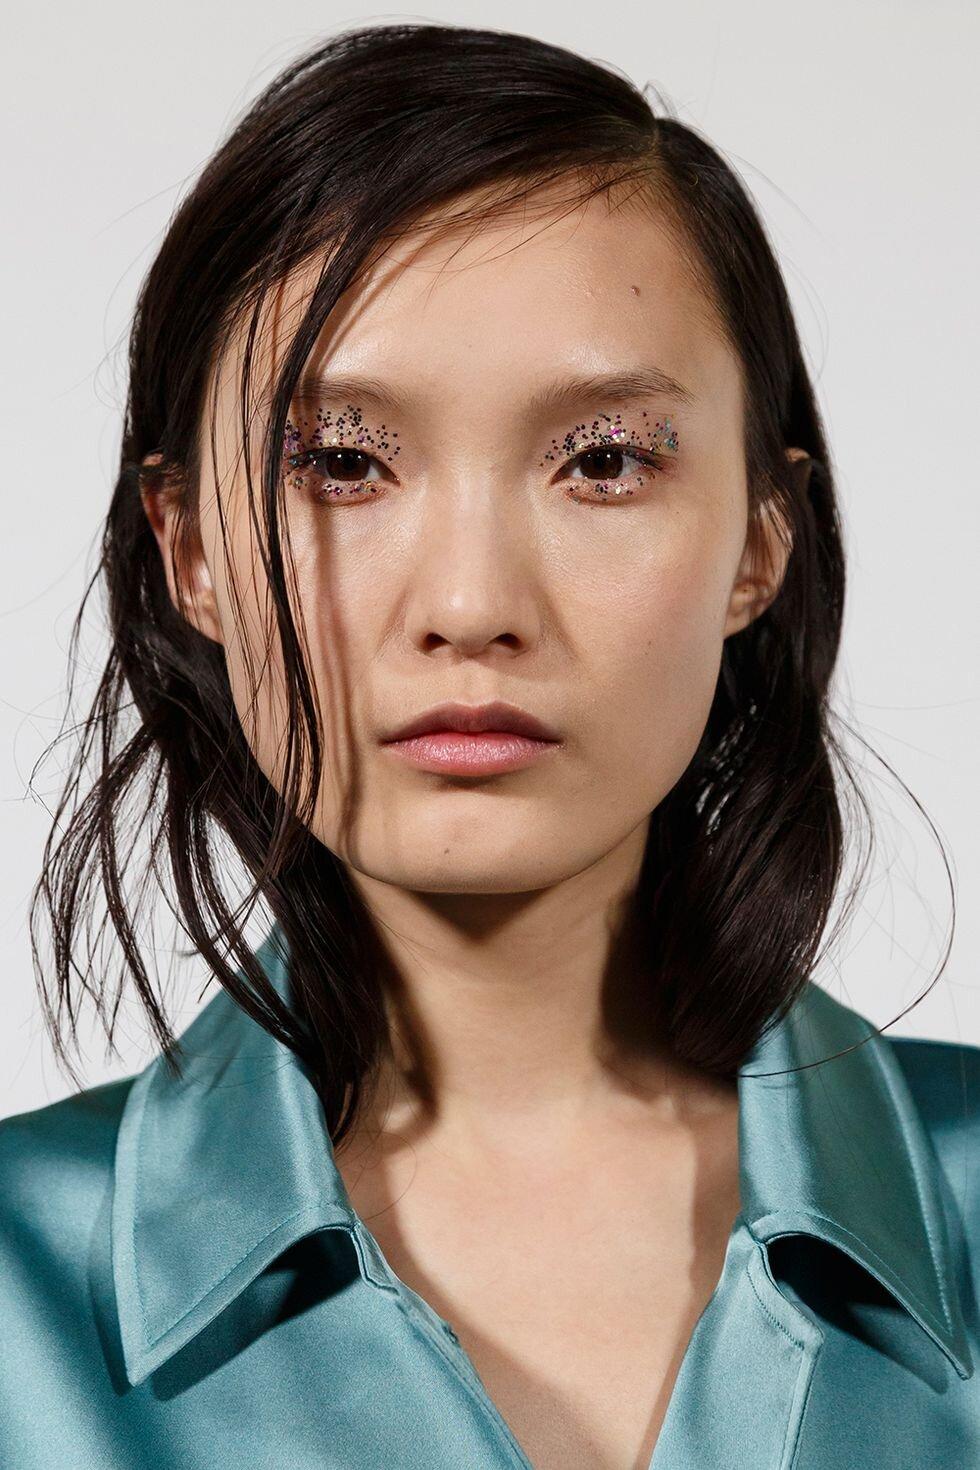 aw19-makeup-trends-maximalist-minimalist-dries-van-noten-imaxtree-1552314739.jpg